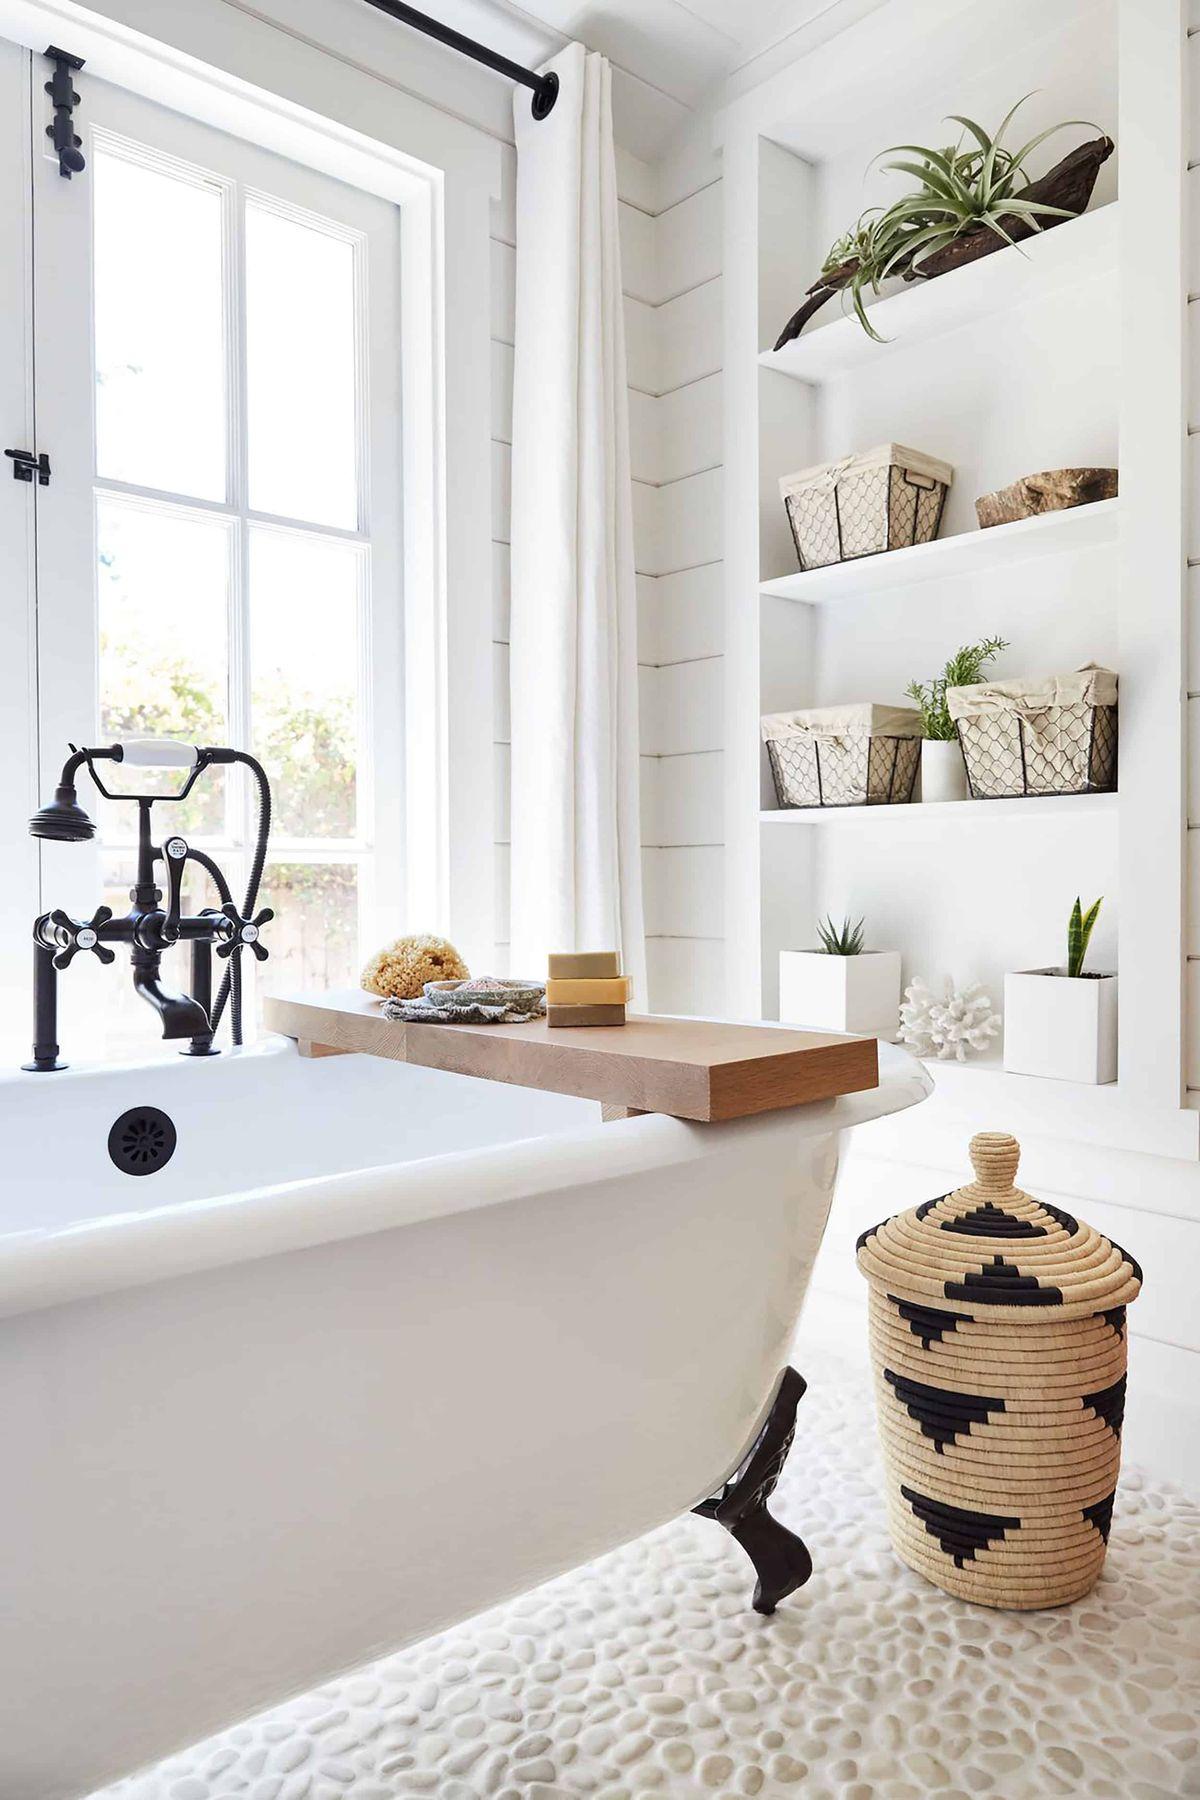 Pebble Tile Badezimmerboden Coastal Tile via Trinettereed